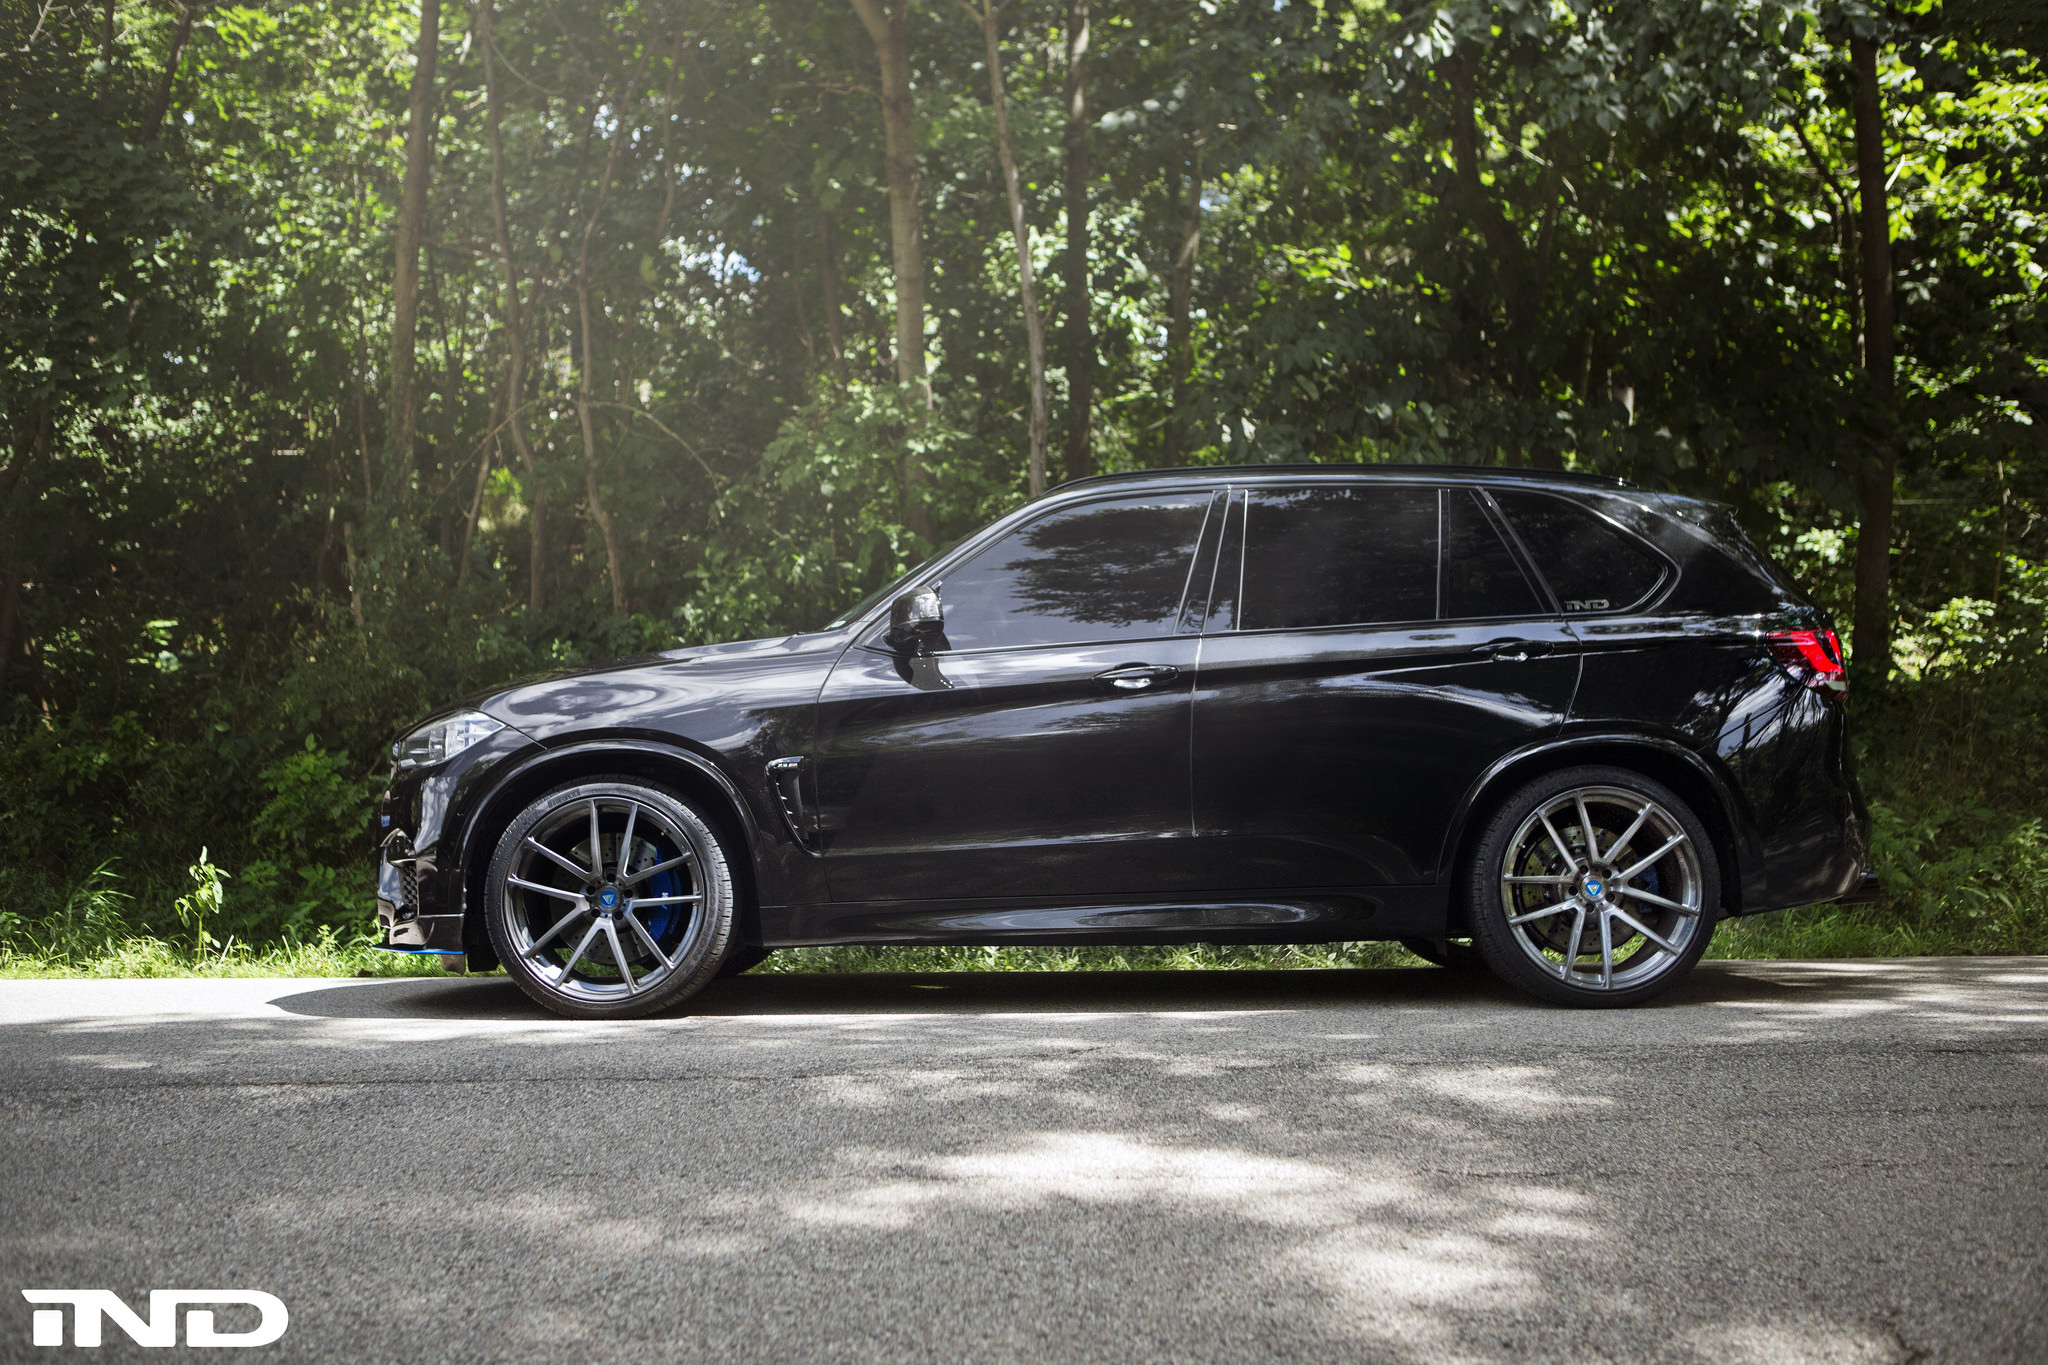 Bmw X5 Monster Truck >> Black Sapphire Metallic BMW F85 X5M By IND Distribution